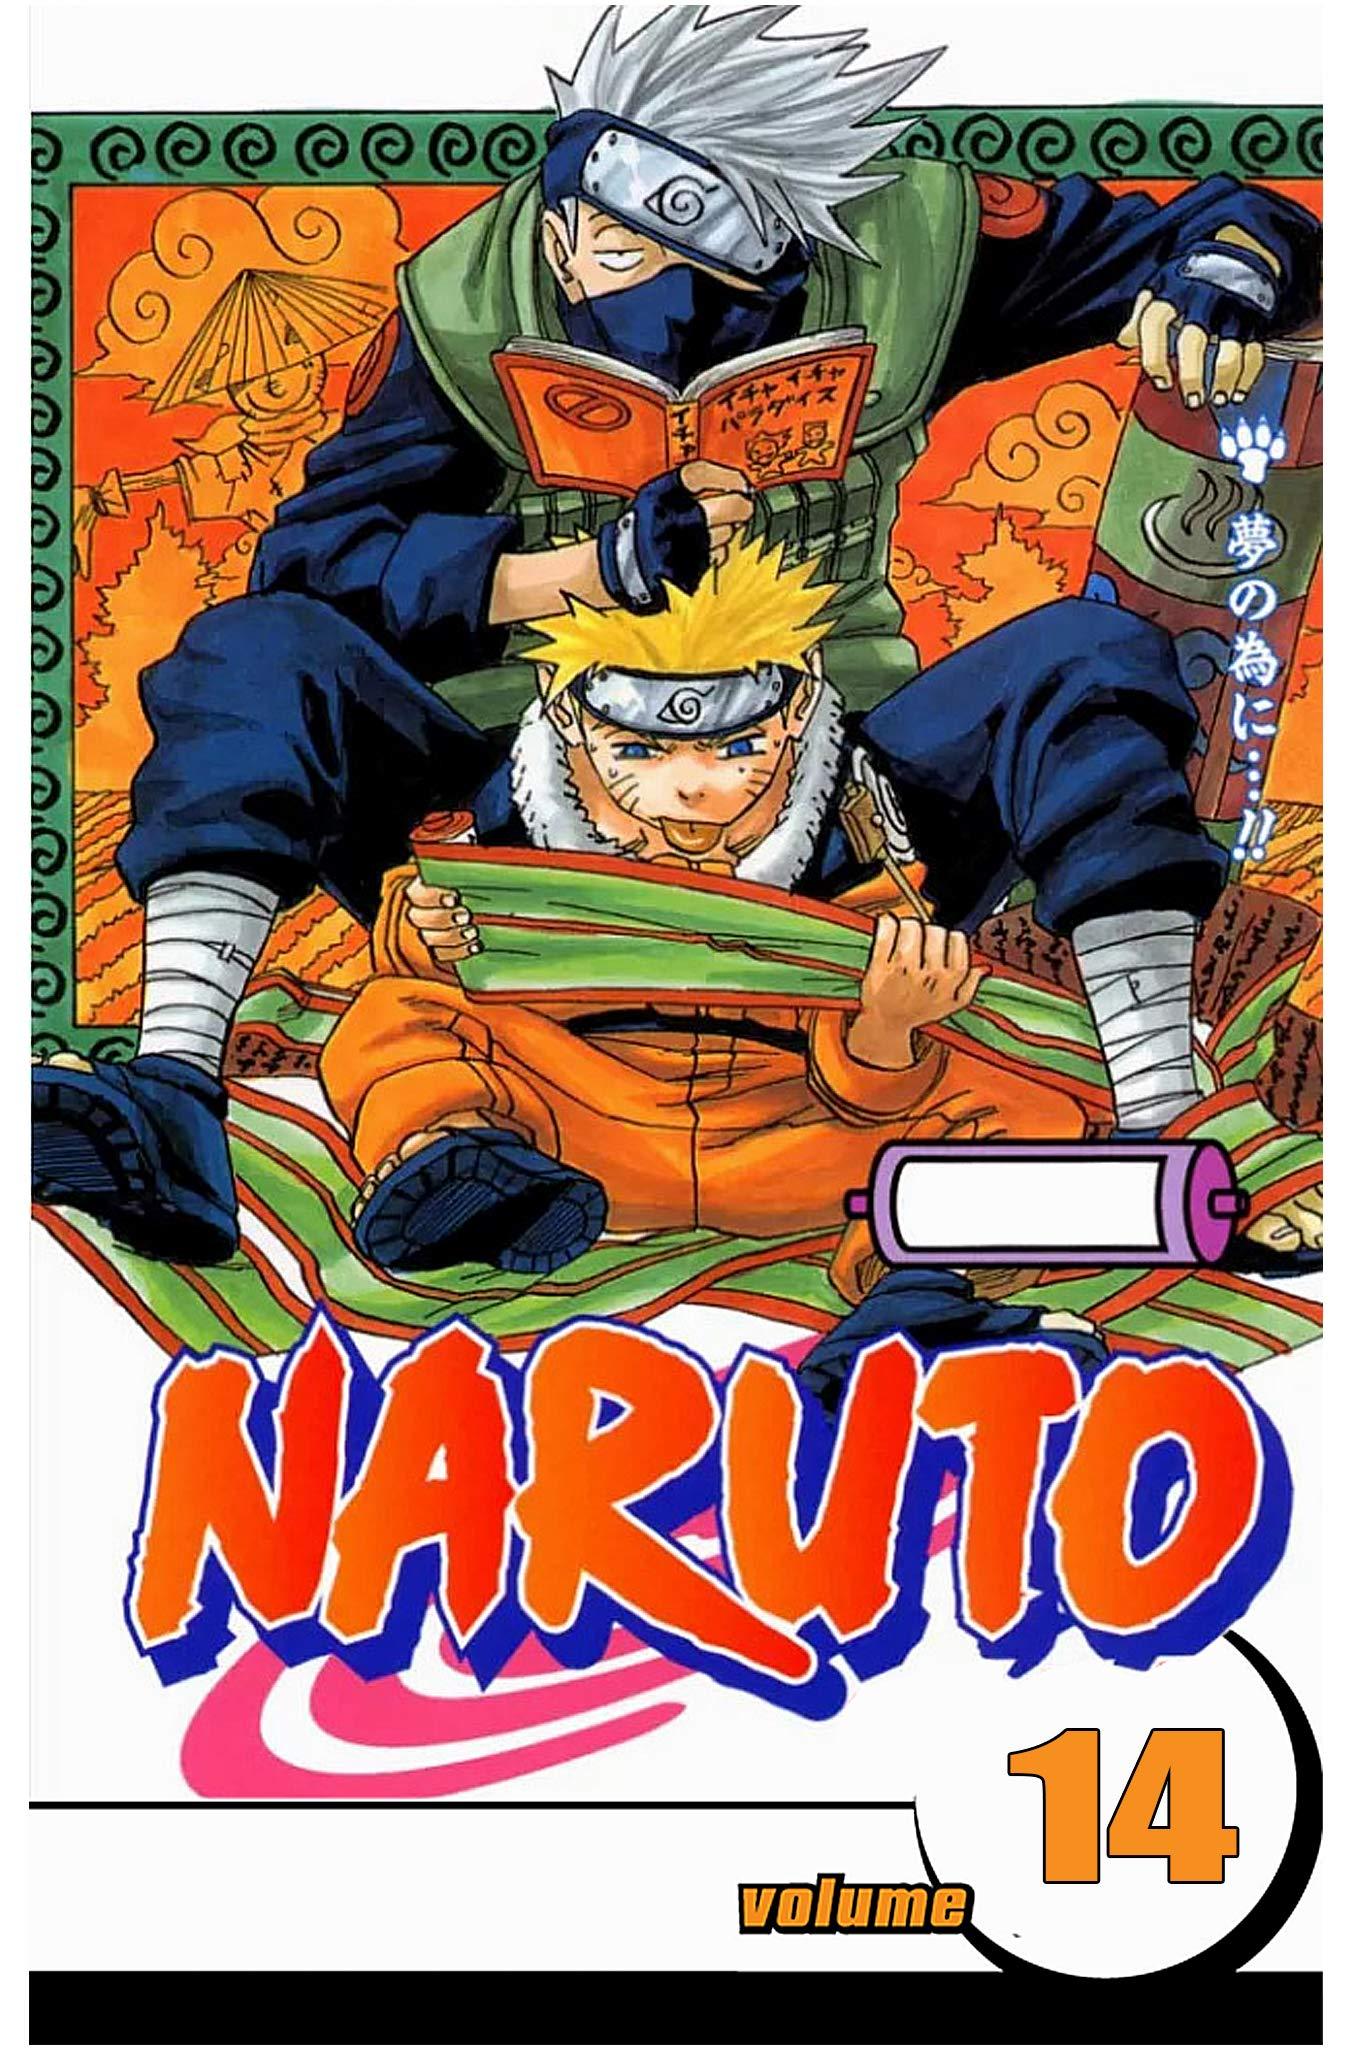 Naruto: Uzumaki Volume 14